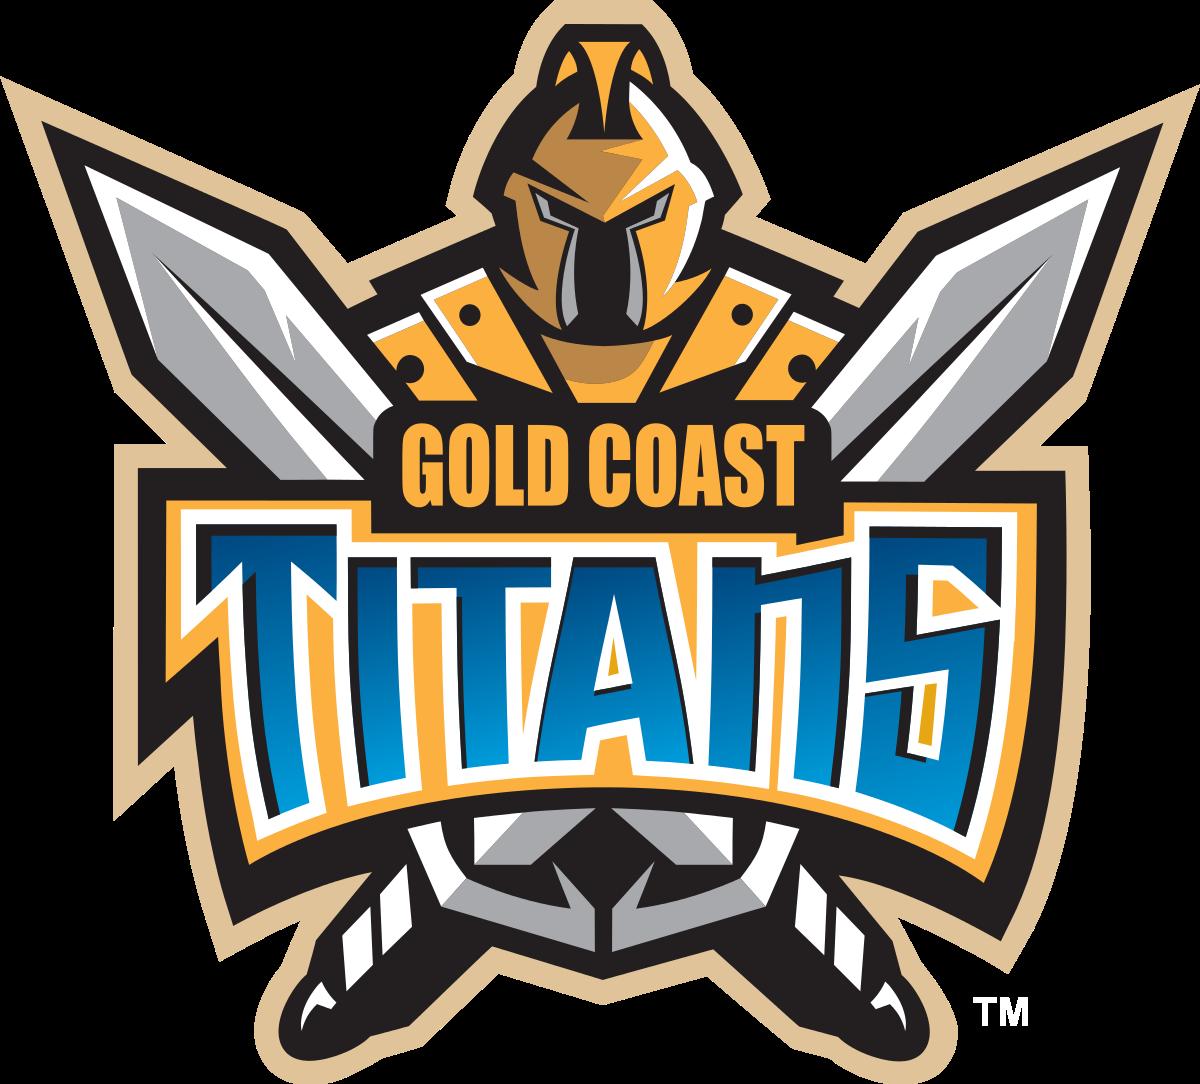 Programme TV Gold Coast Titans